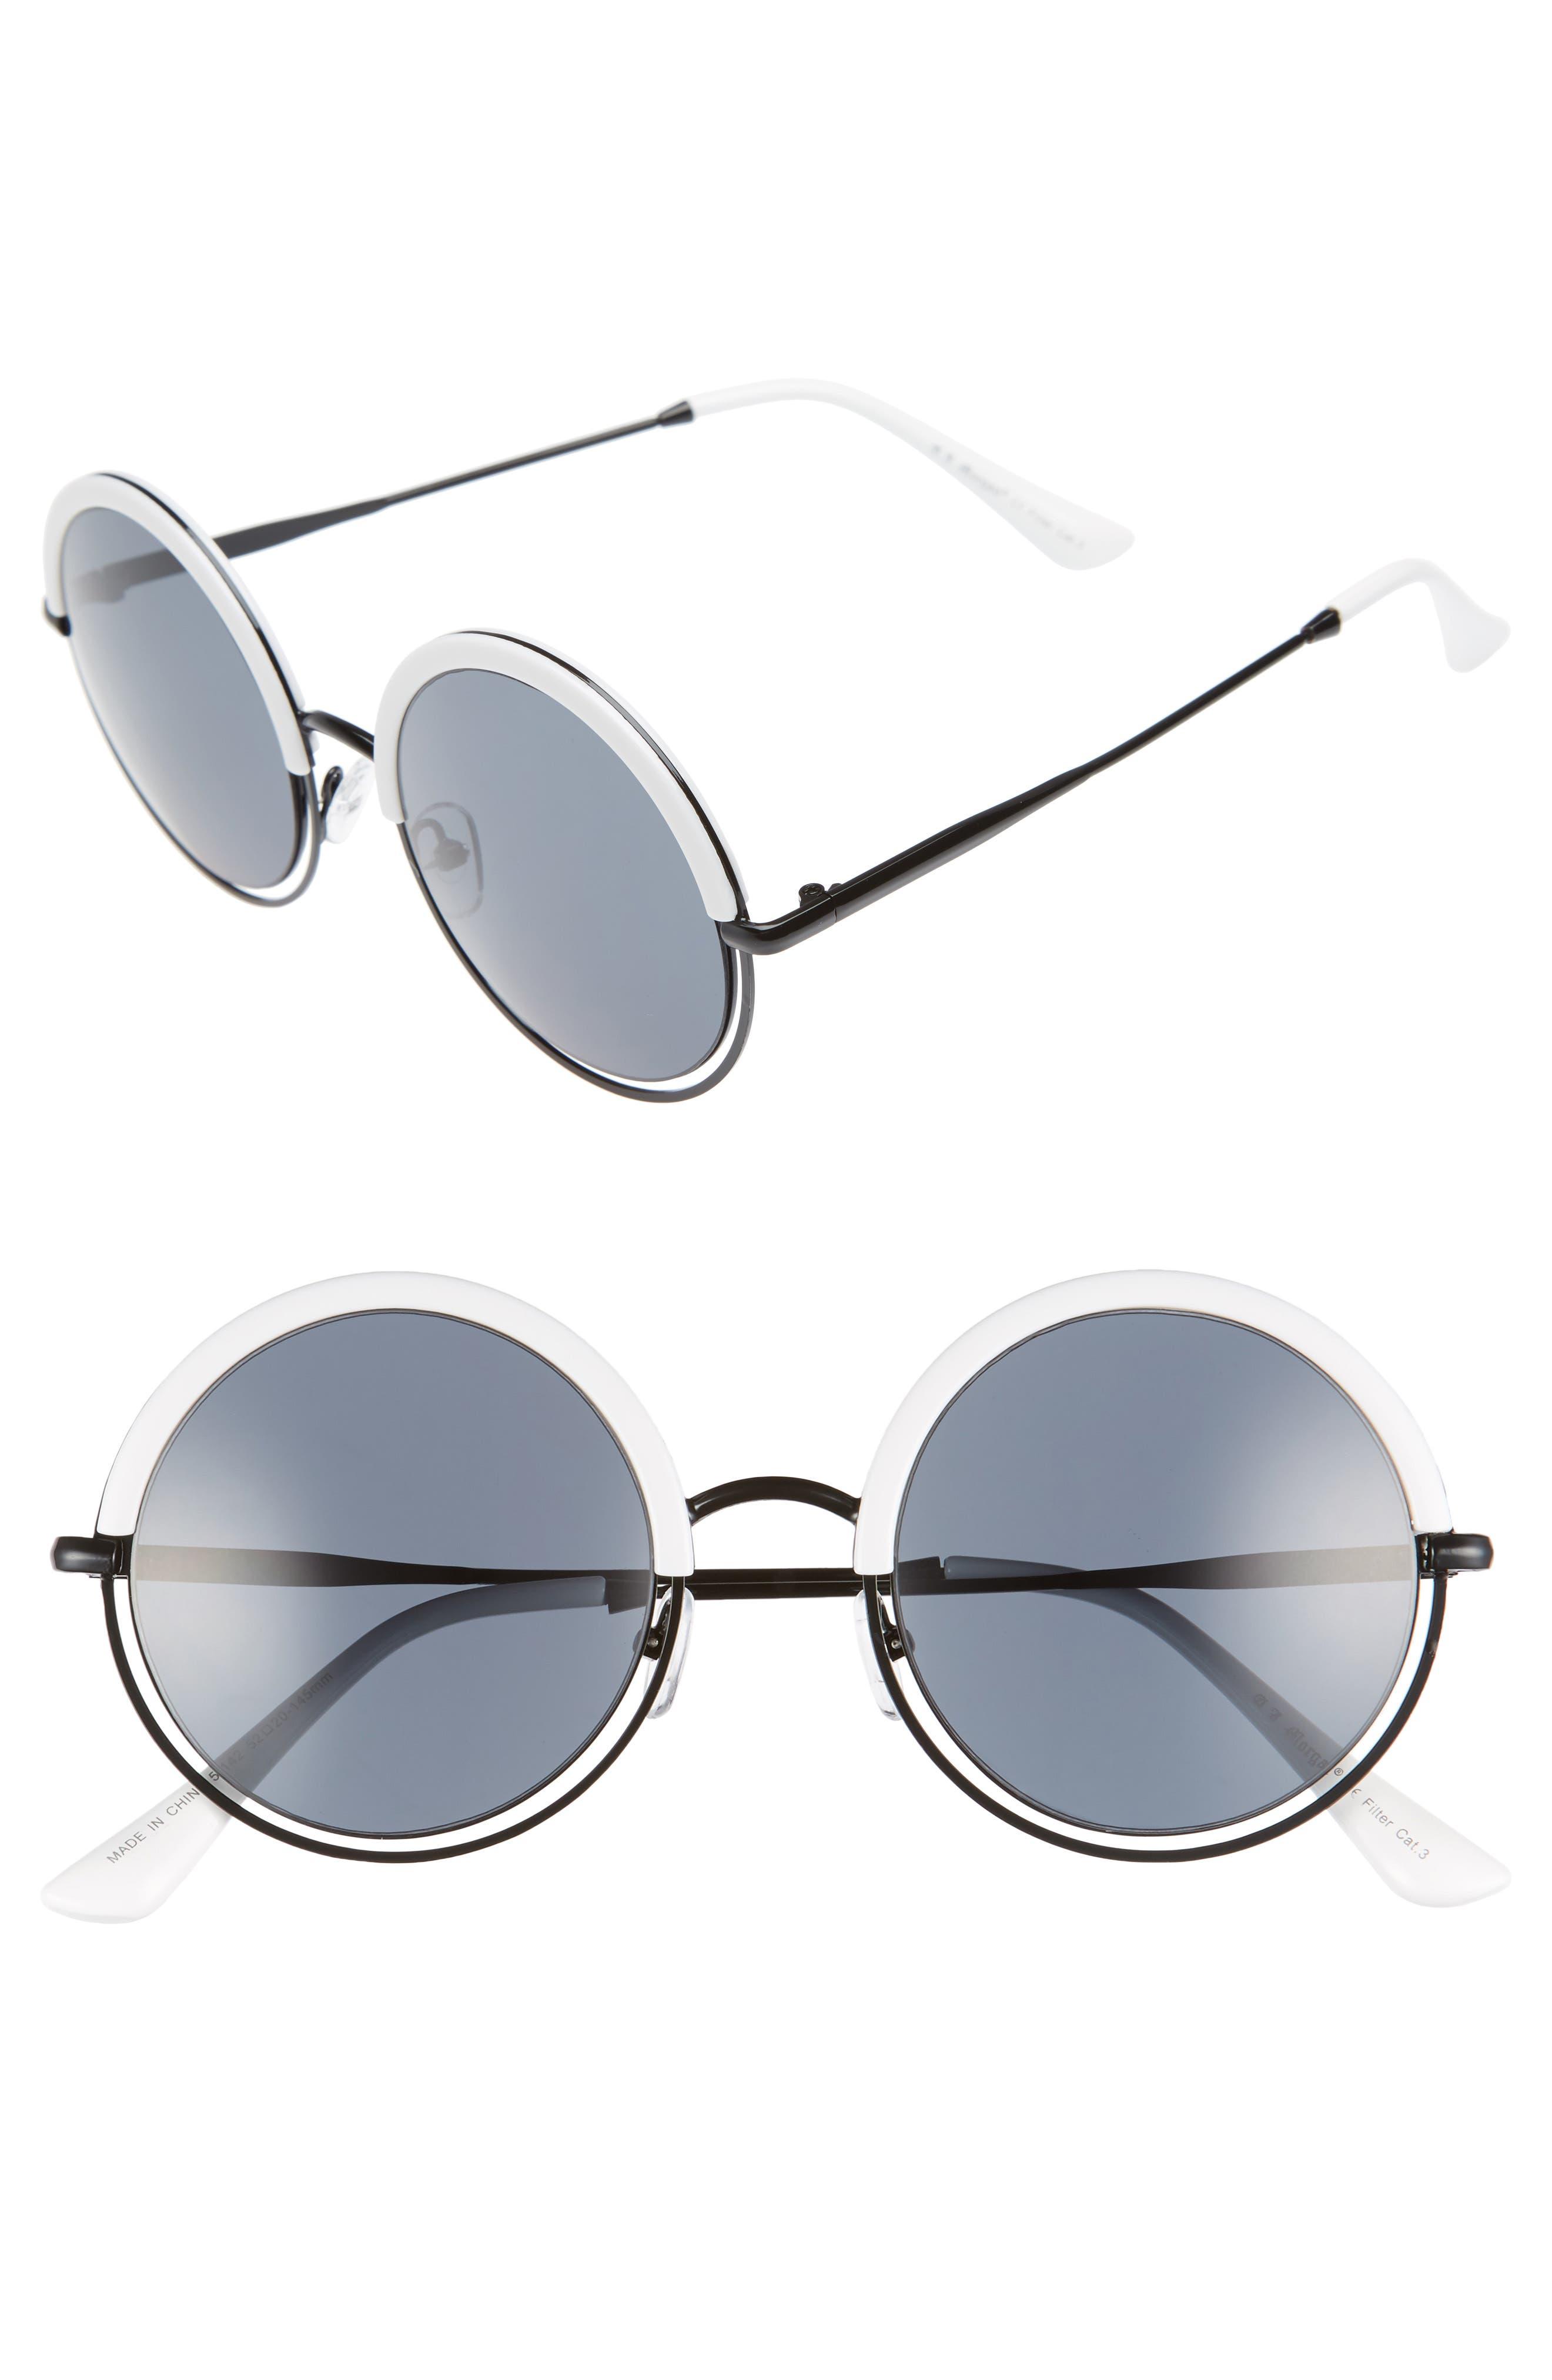 A.J. Morgan Pancakes 52mm Gradient Lens Round Sunglasses